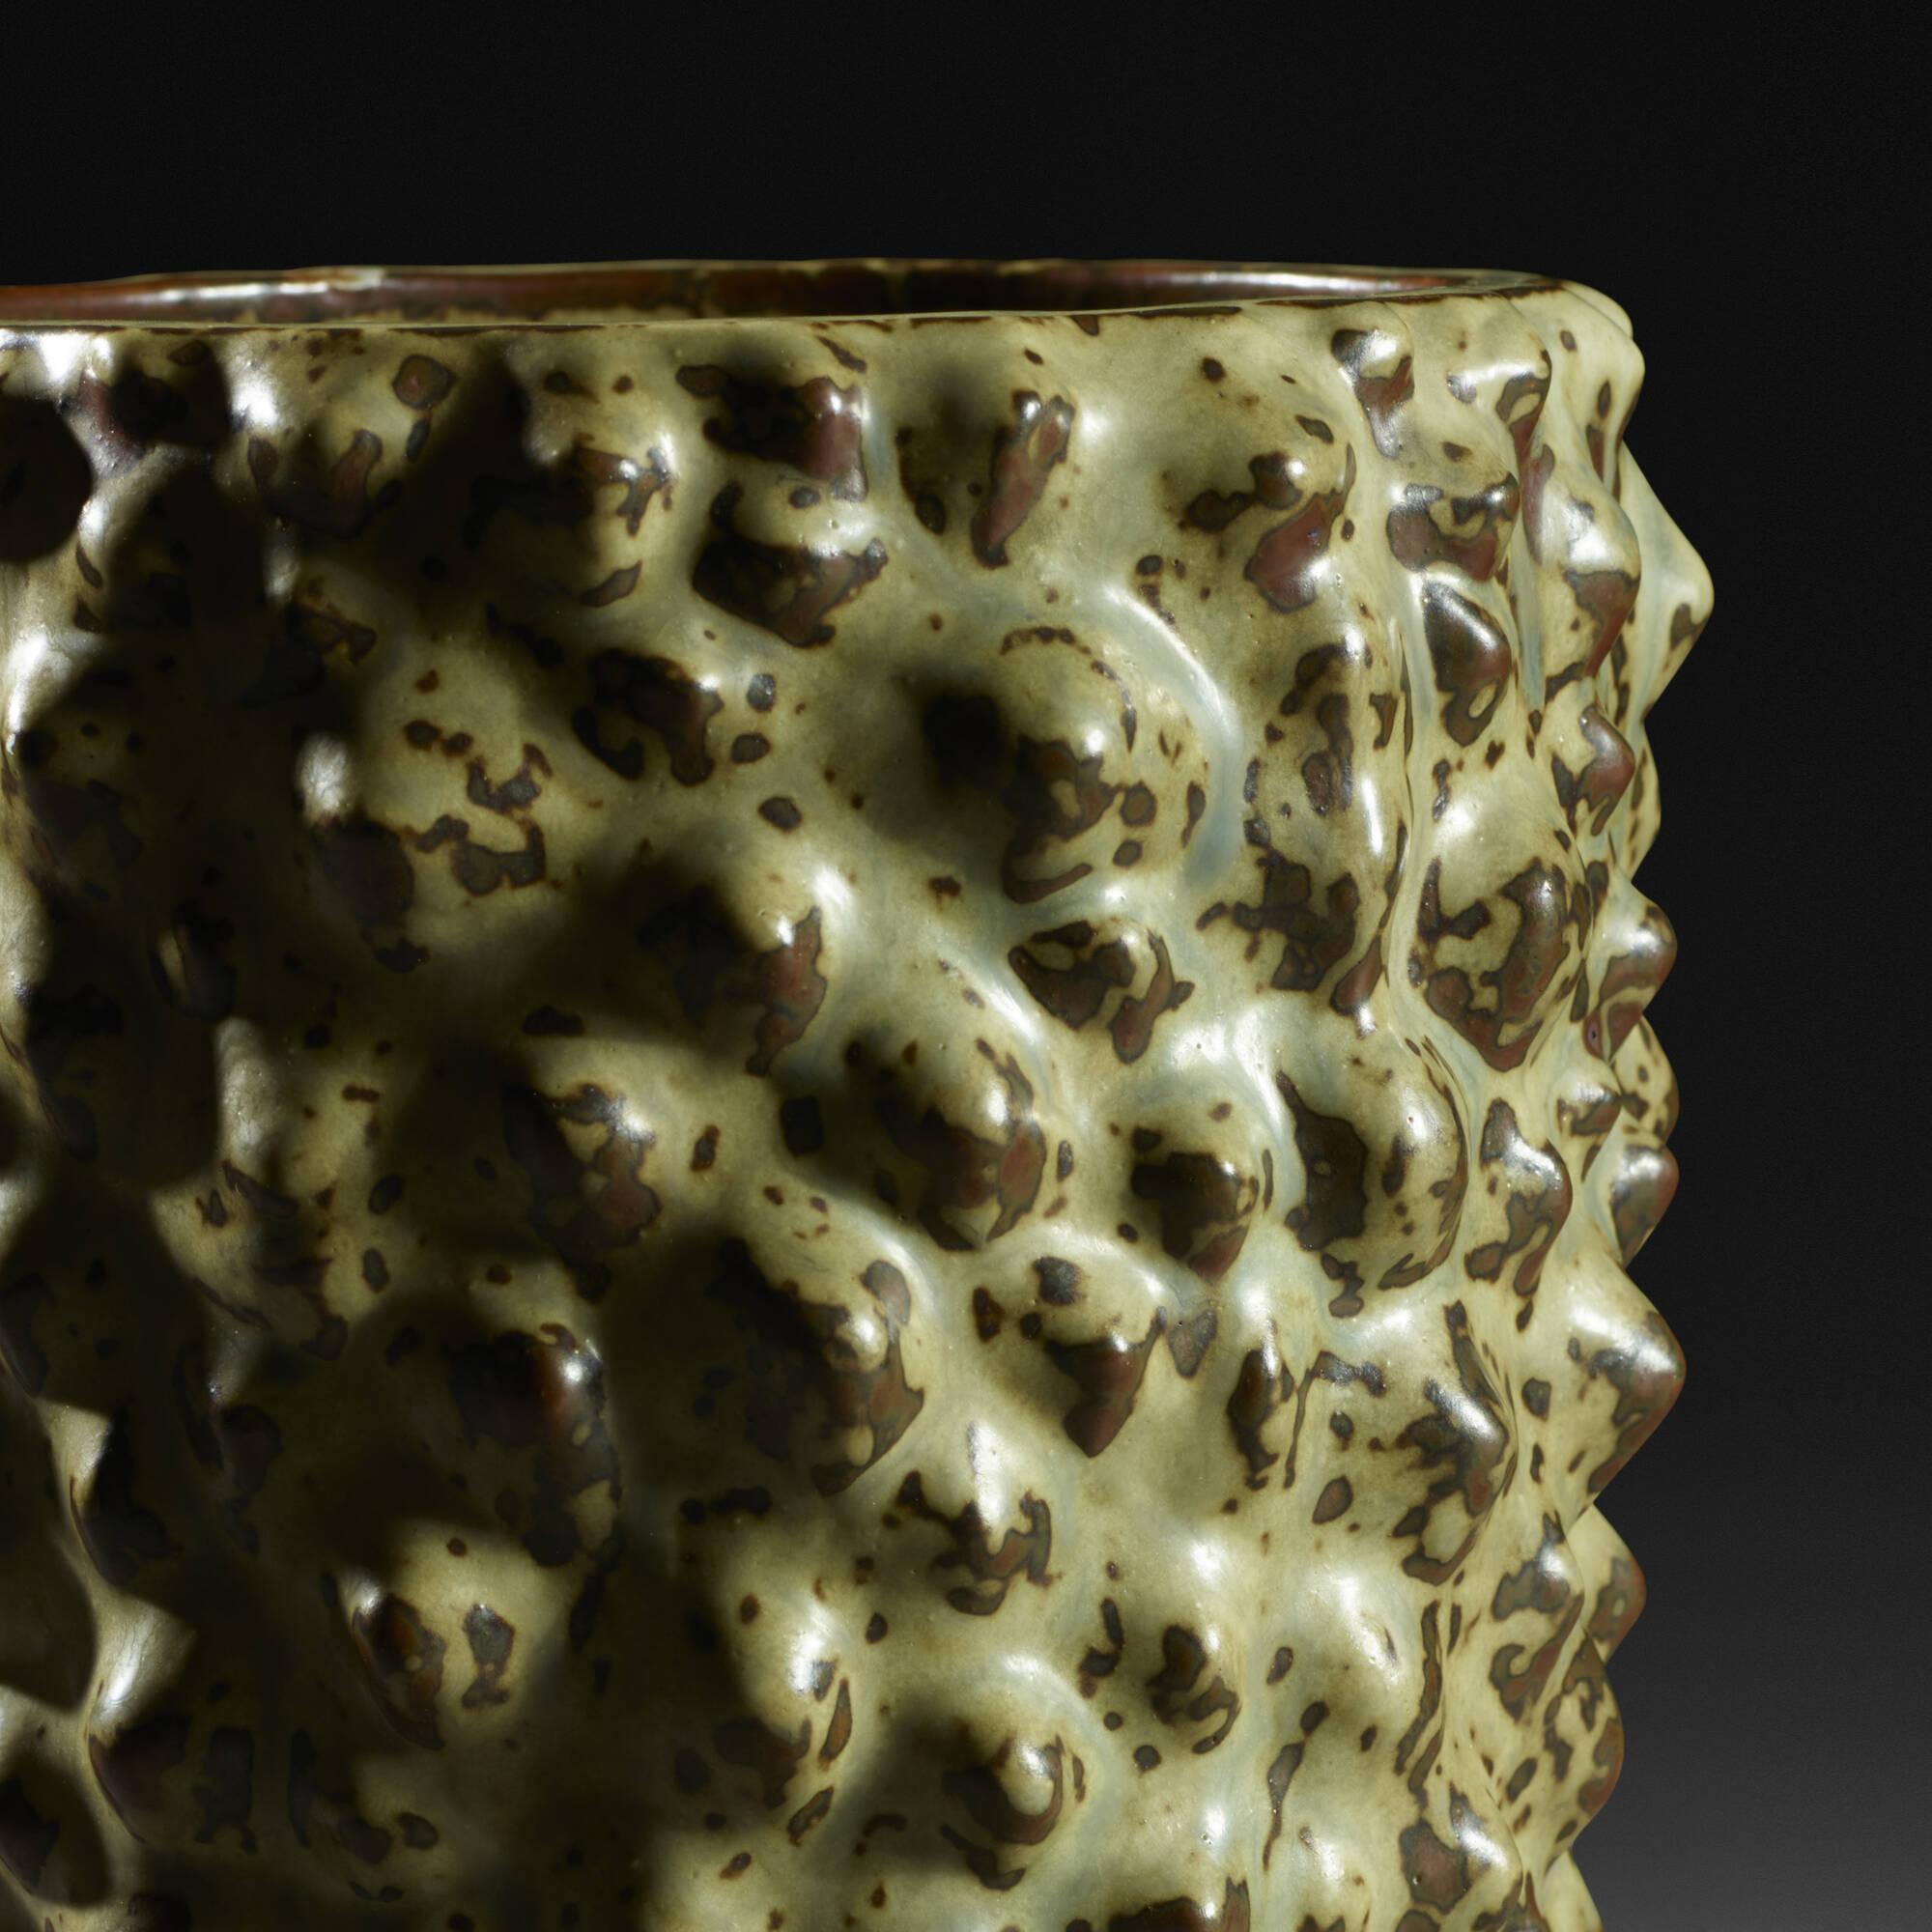 143: Axel Salto / Budding vase (2 of 4)